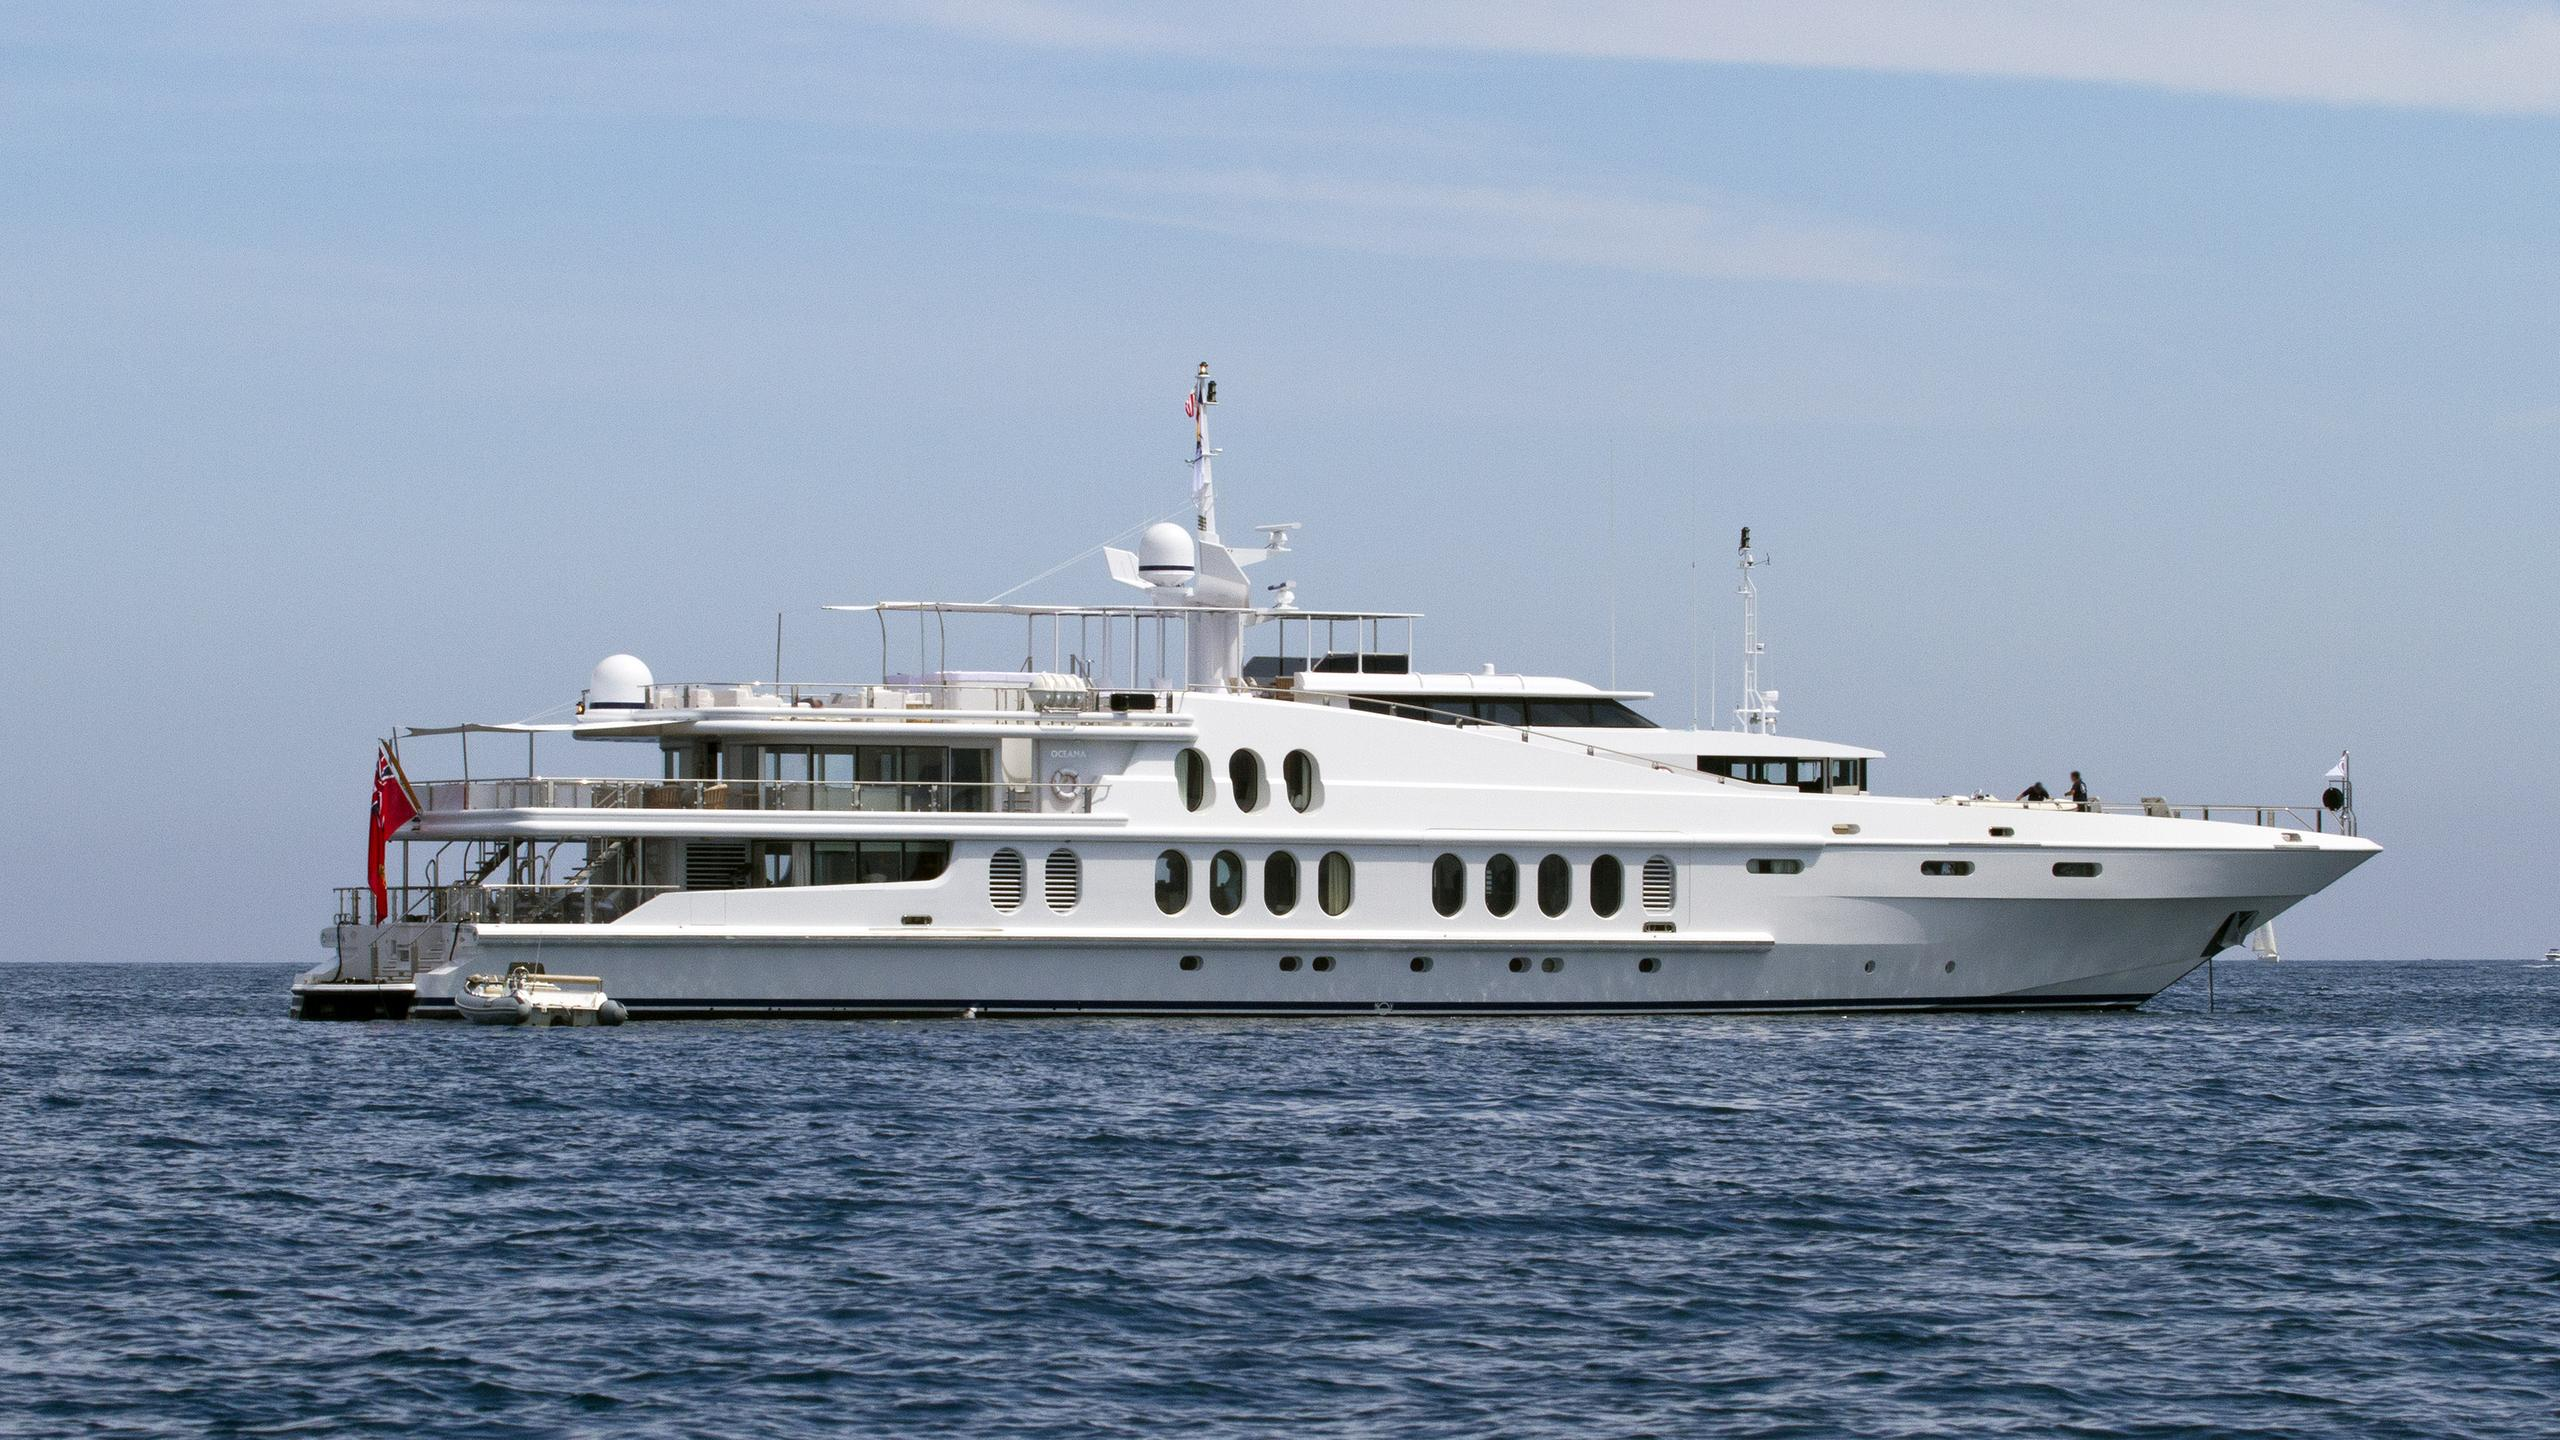 oceana-motor-yacht-oceanfast-1991-55m-profile